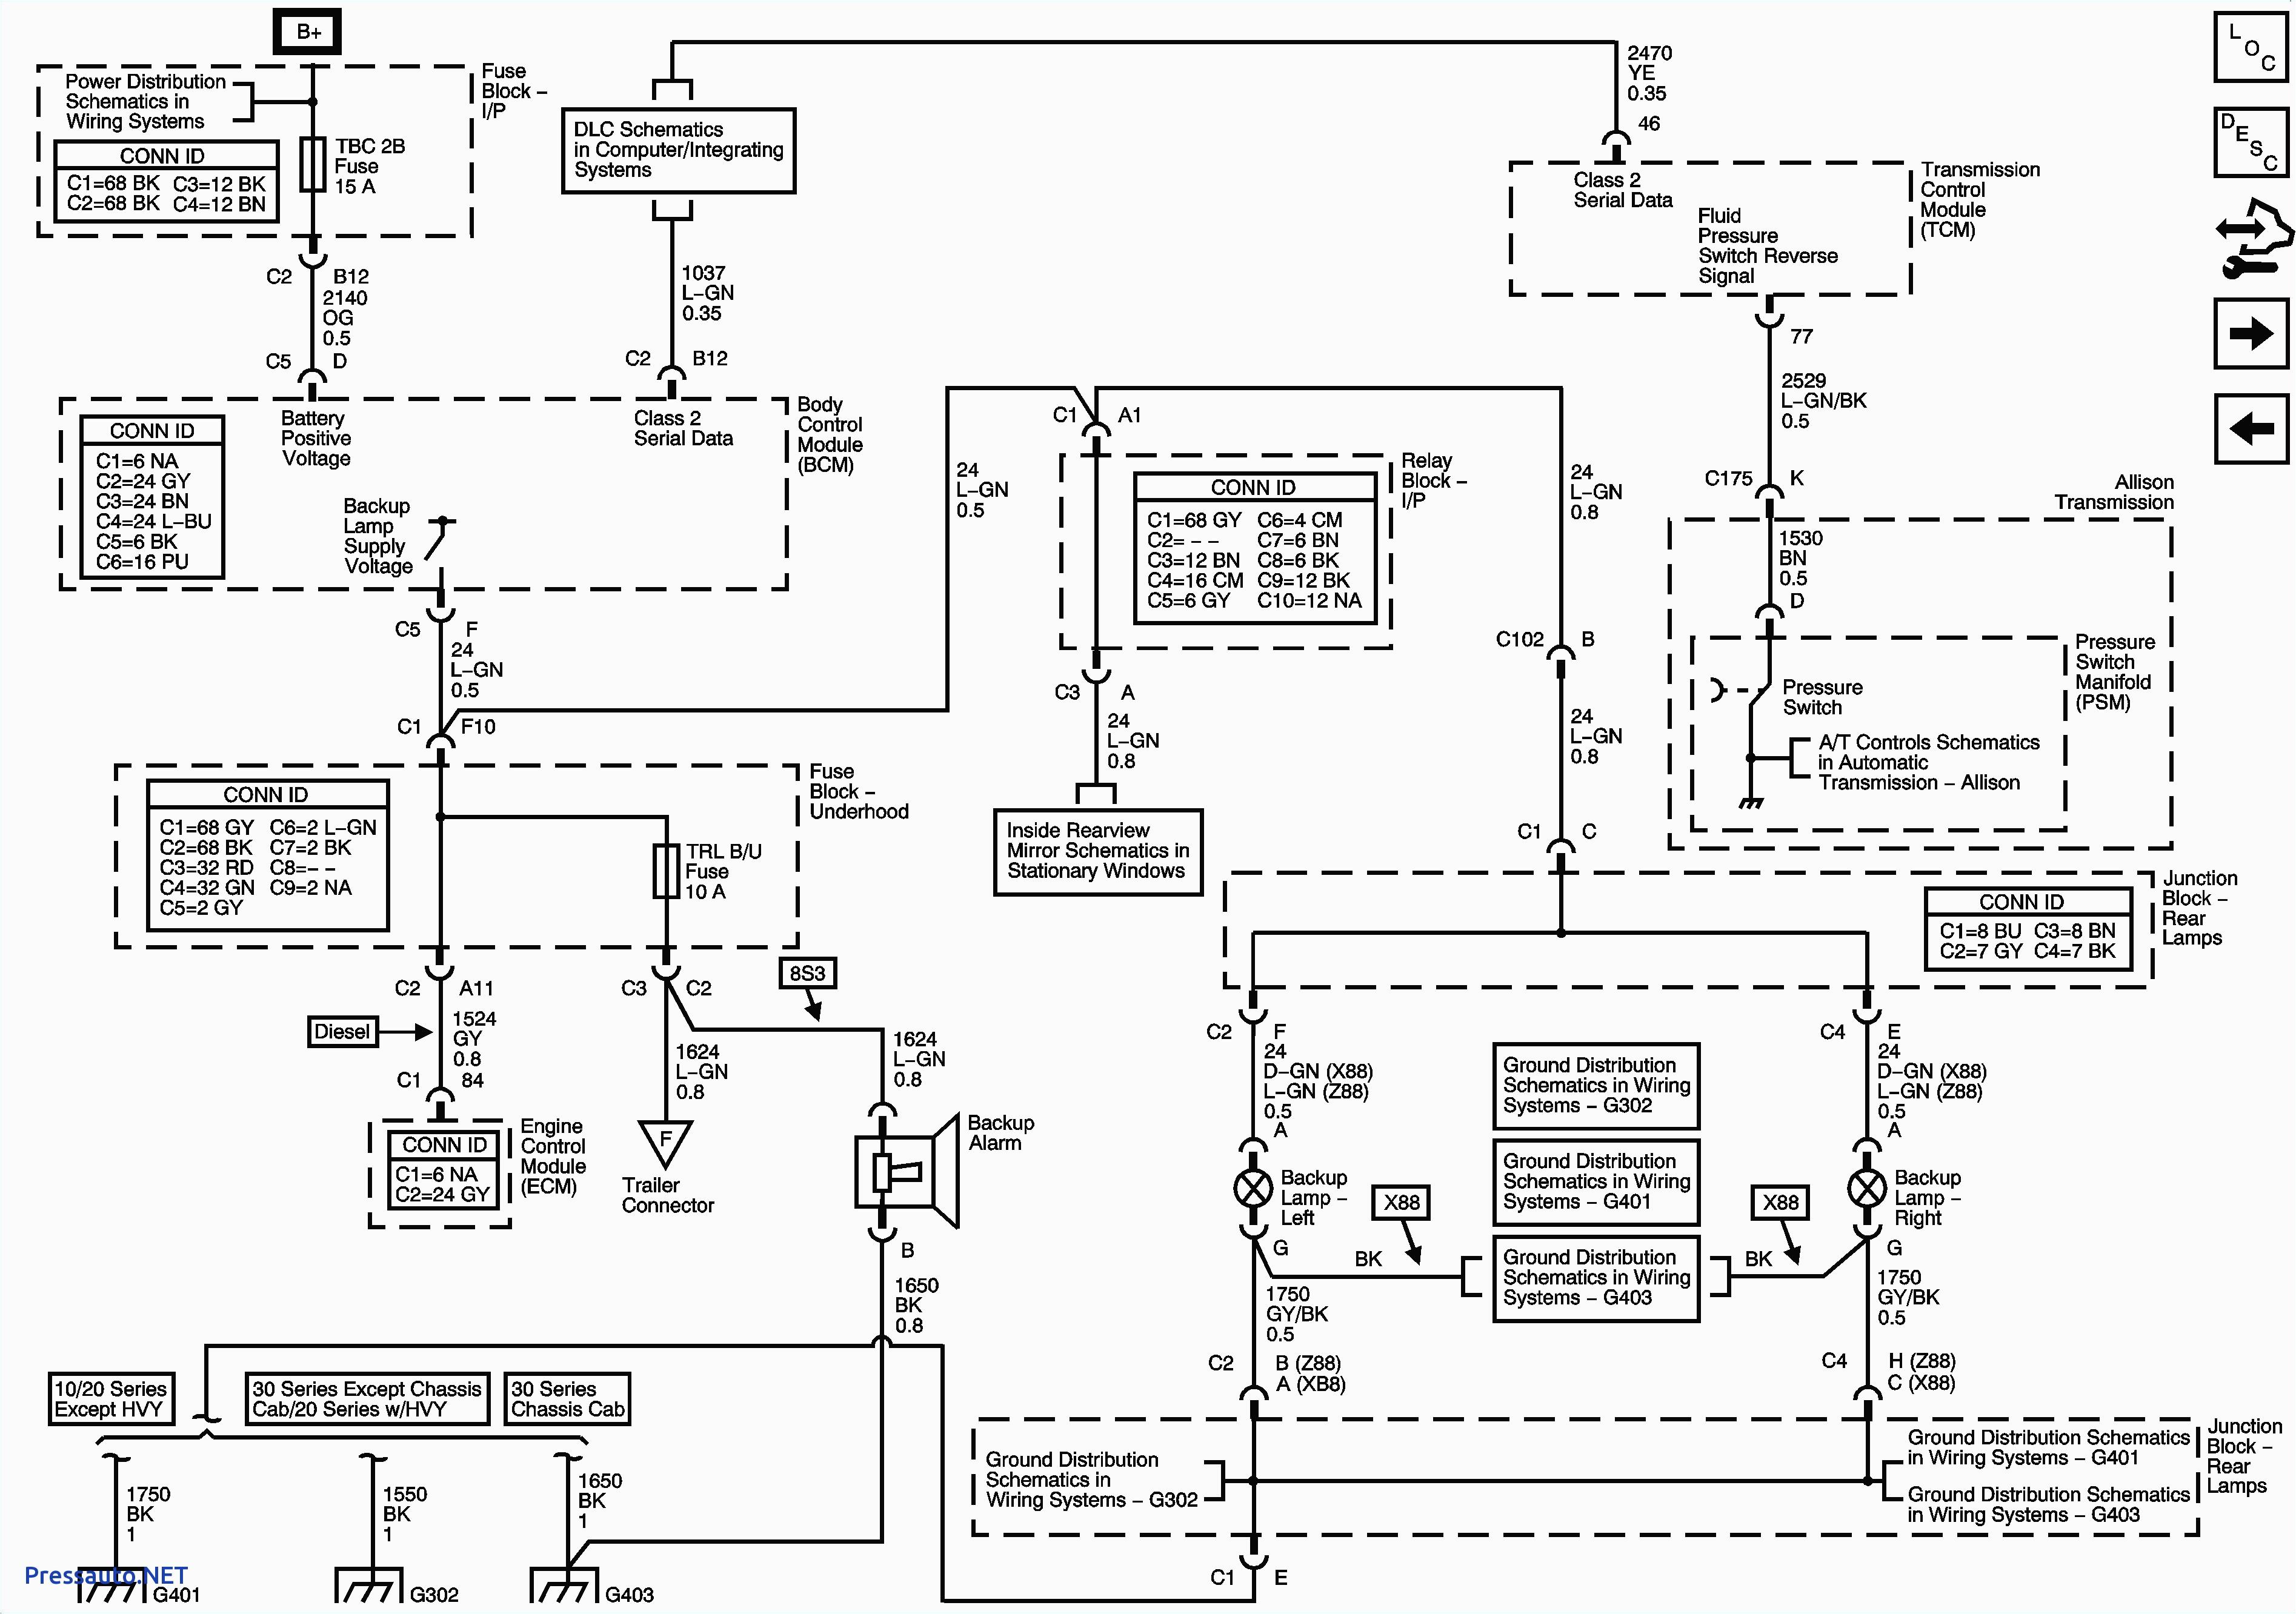 2006 Chevy Silverado Tail Light Wiring Diagram Silverado Wiring Diagram Wiring Diagram Page